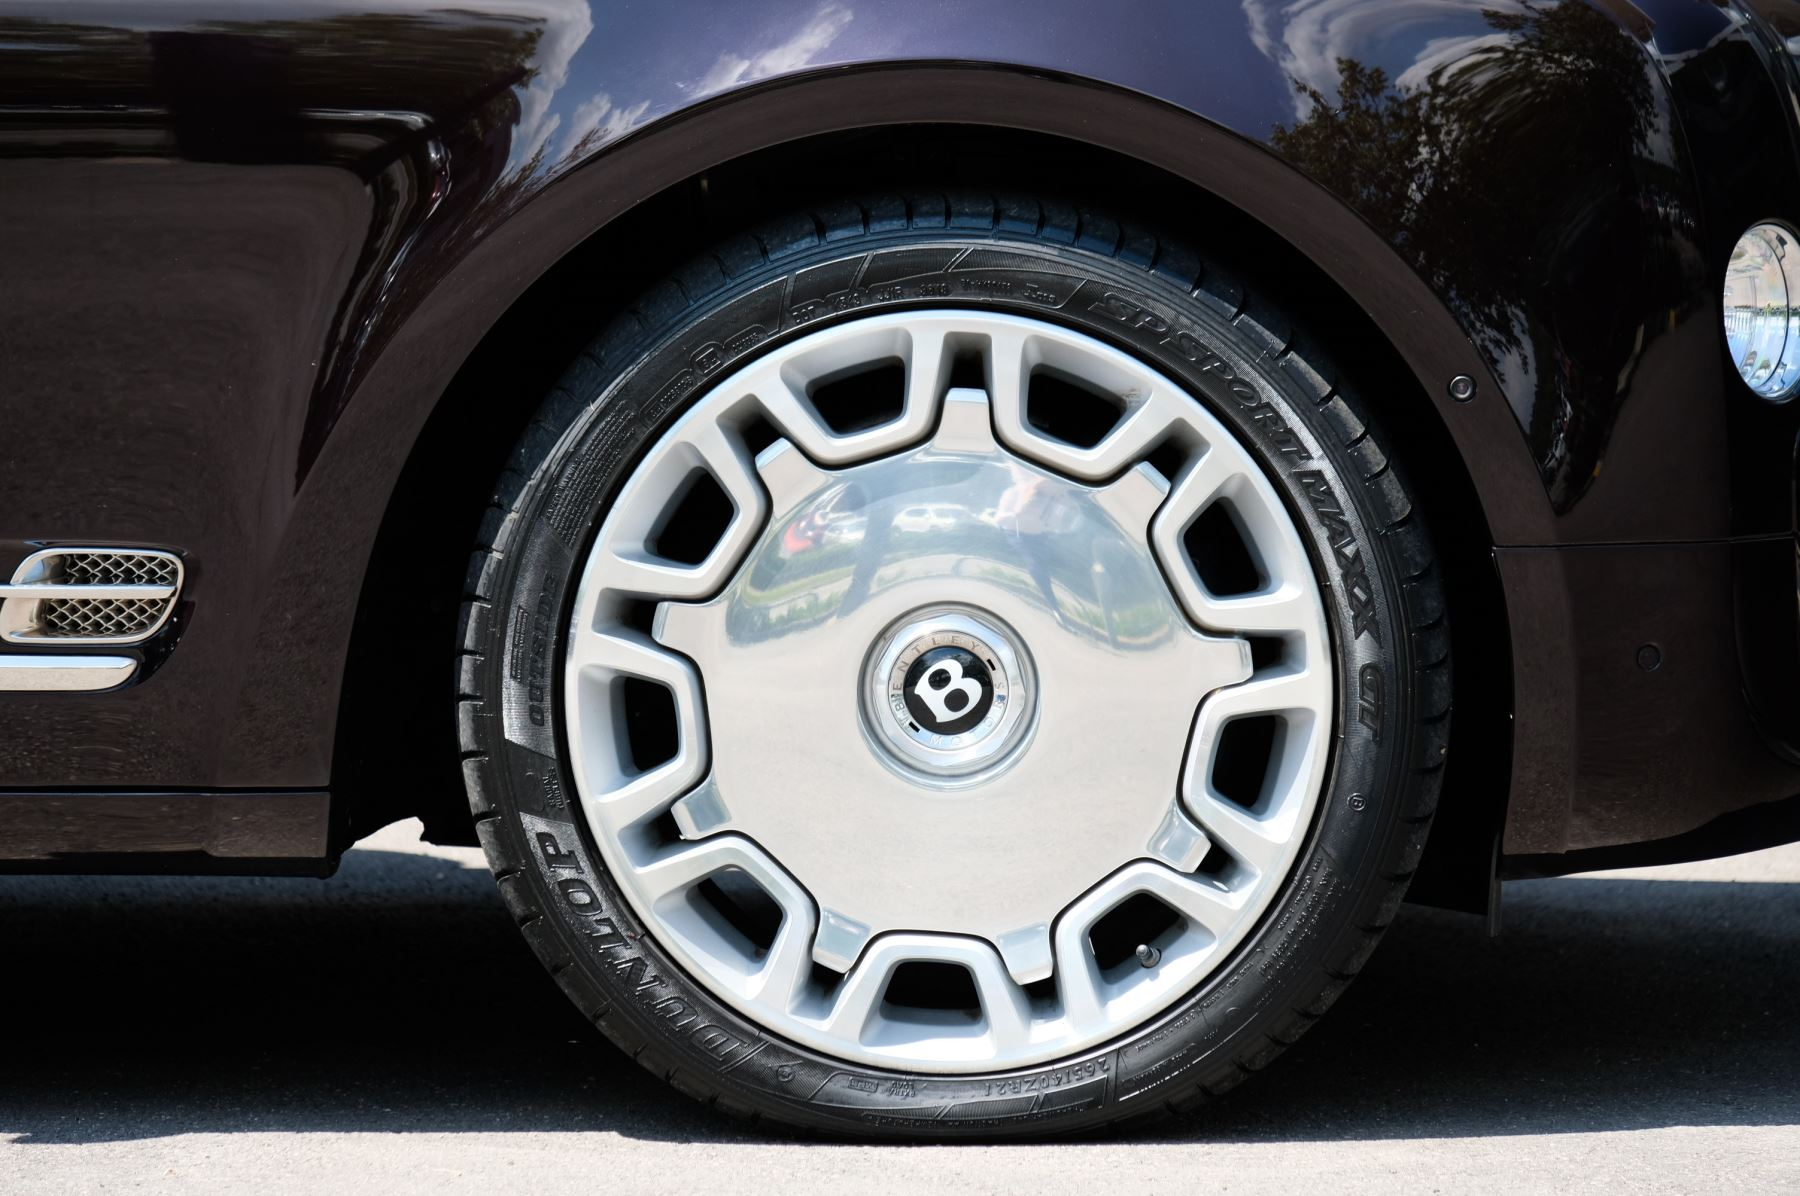 Bentley Mulsanne 6.8 V8 - Comfort, Entertainment and Premier Specification image 8